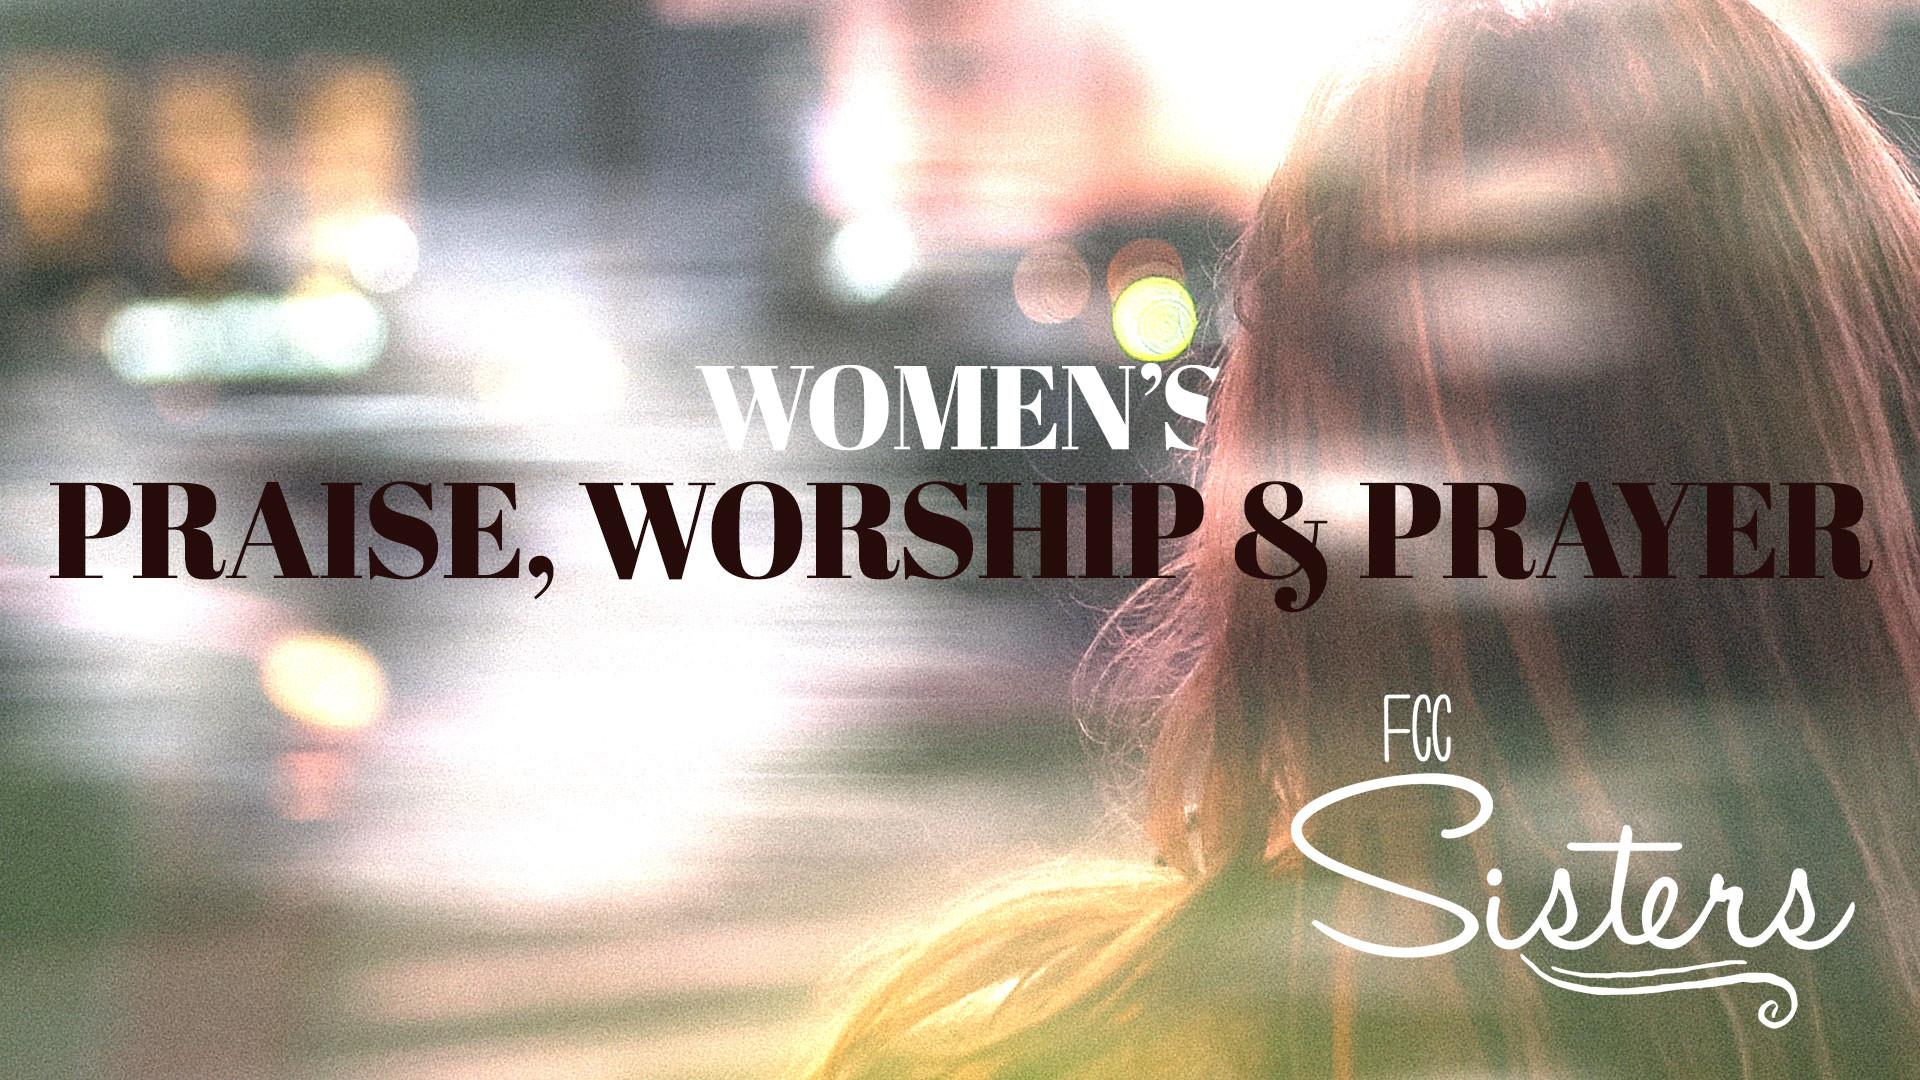 Women's Praise, Worship, & Prayer